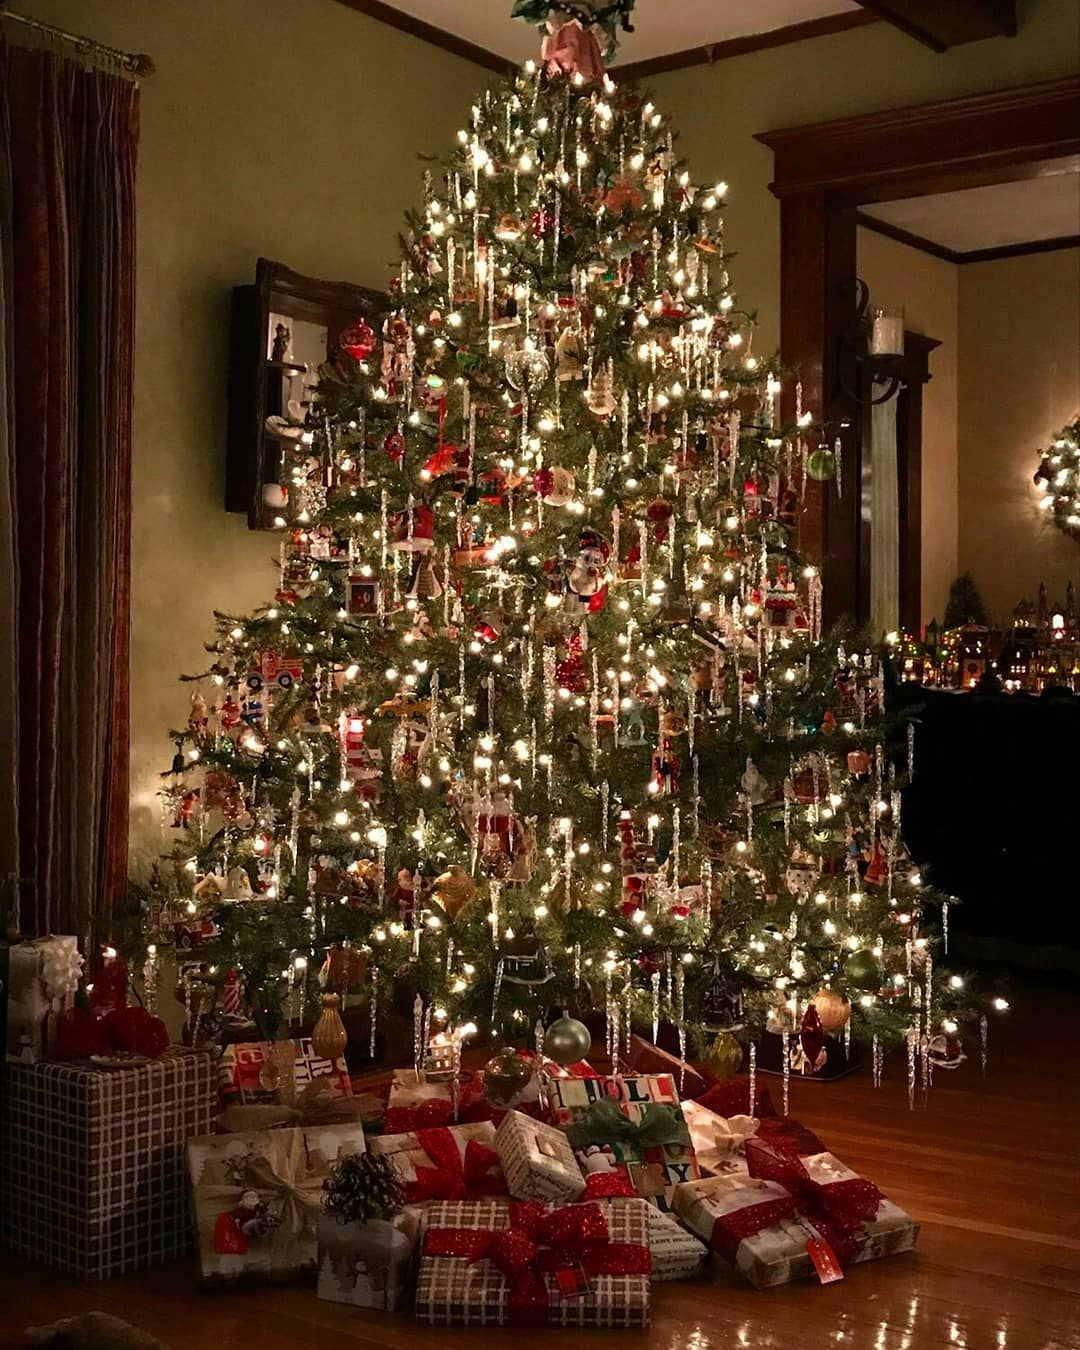 Vintage Christmas Decoration Ideas For 2020 100+ Creative Ideas For Christmas Home Decor   Page 23 of 41